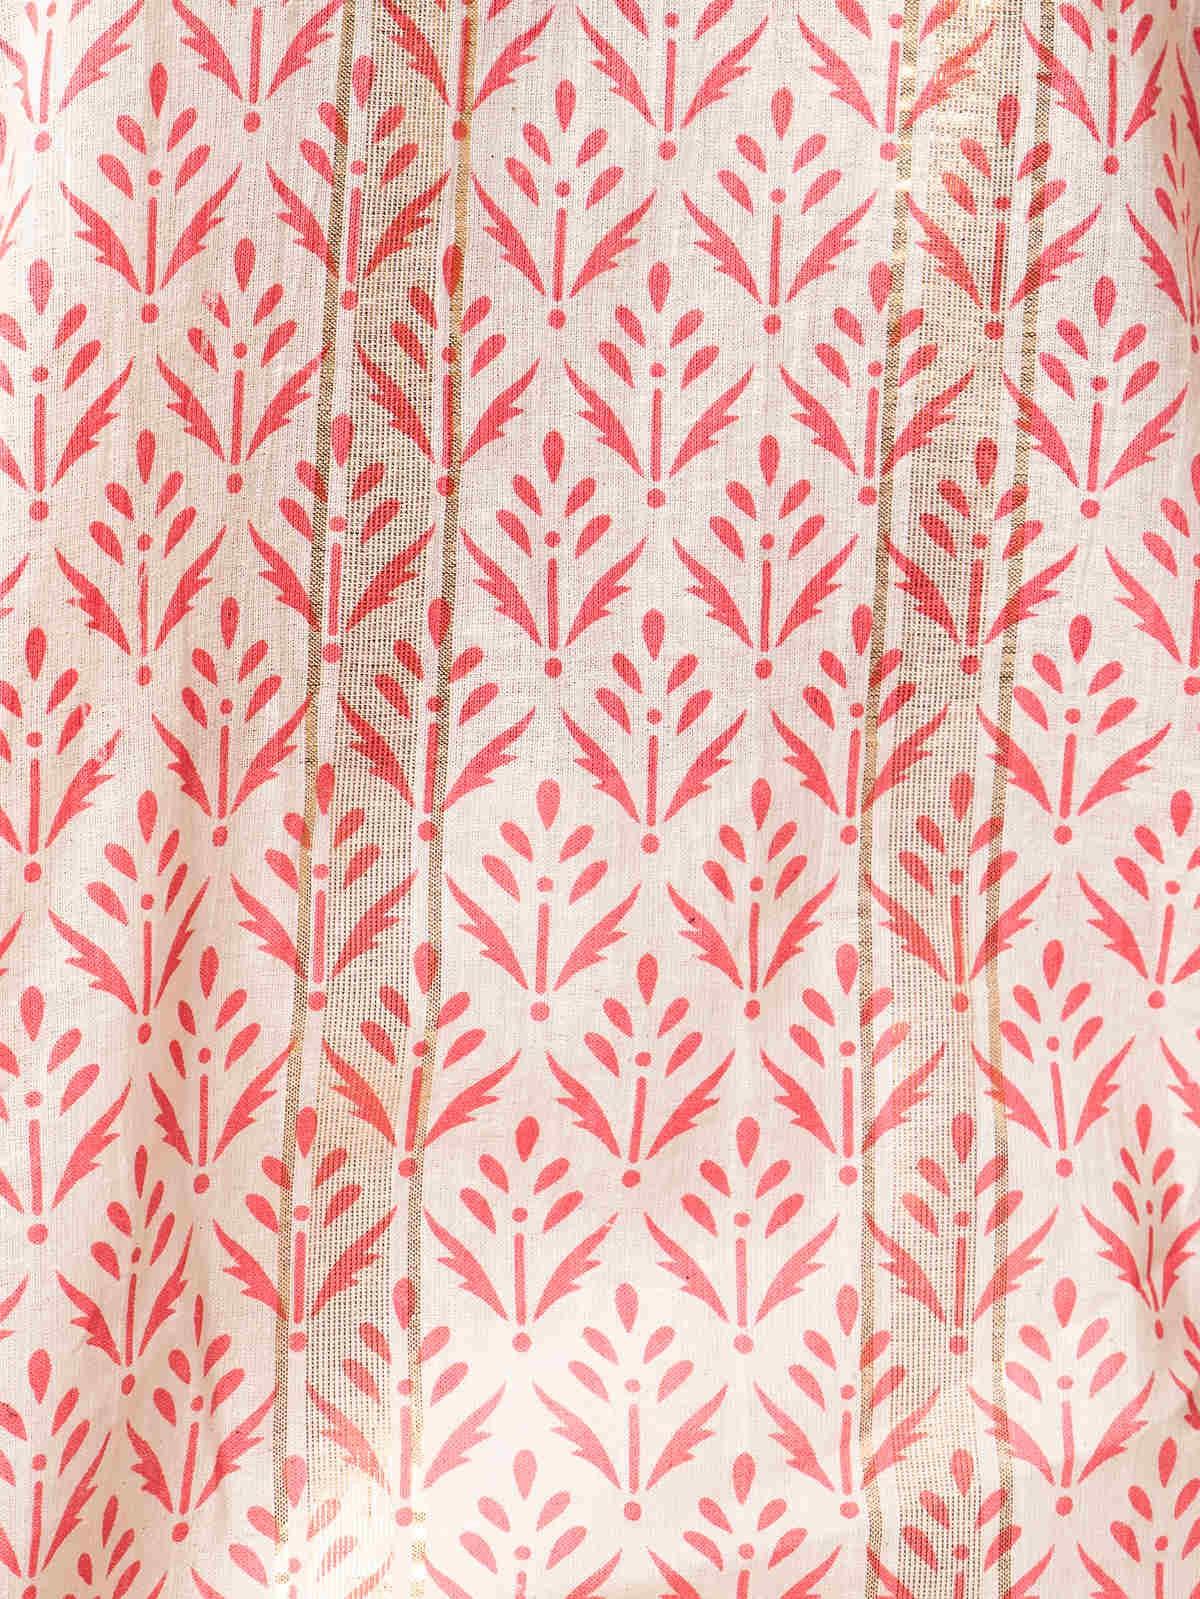 Woman Woman Herringbone print shirt Coral